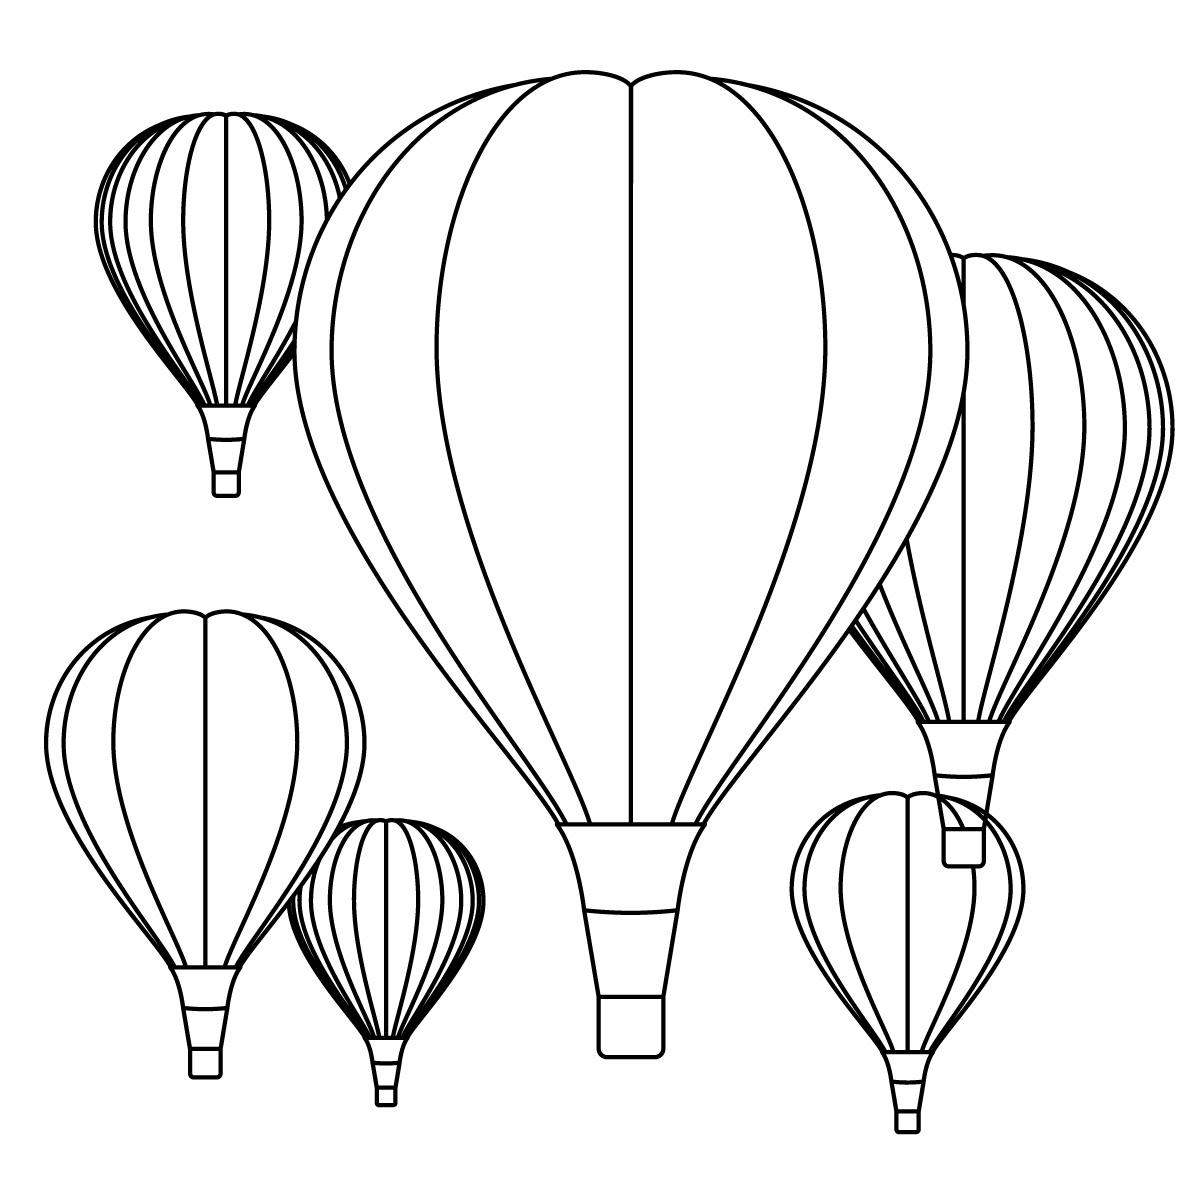 Hot air balloon clipart black and white picture transparent Hot Air Balloon Clipart Black And White   Clipart Panda - Free ... picture transparent